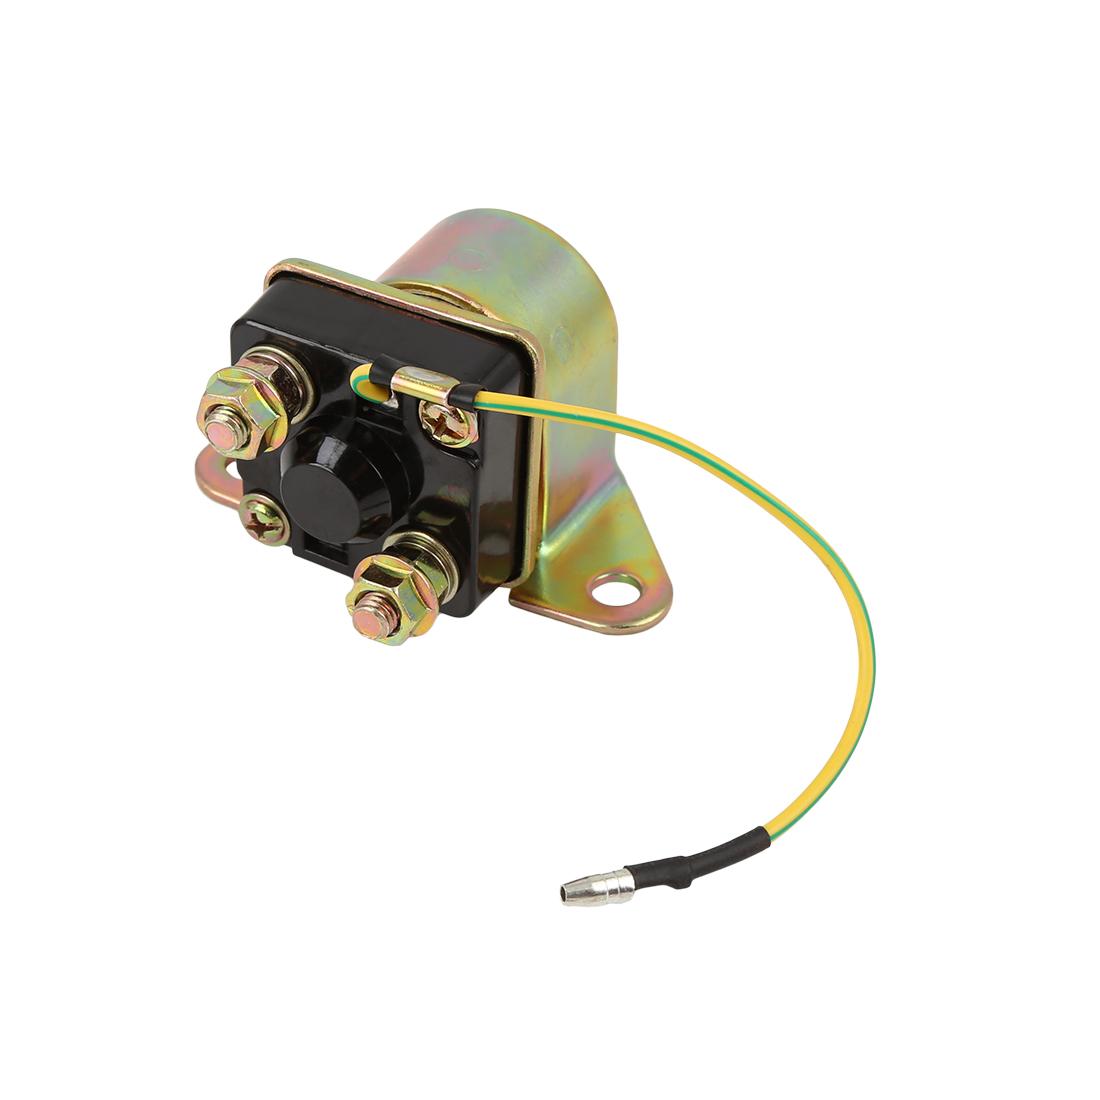 Motorcycle Starter Solenoid Relay for Polaris 3085521 4011335